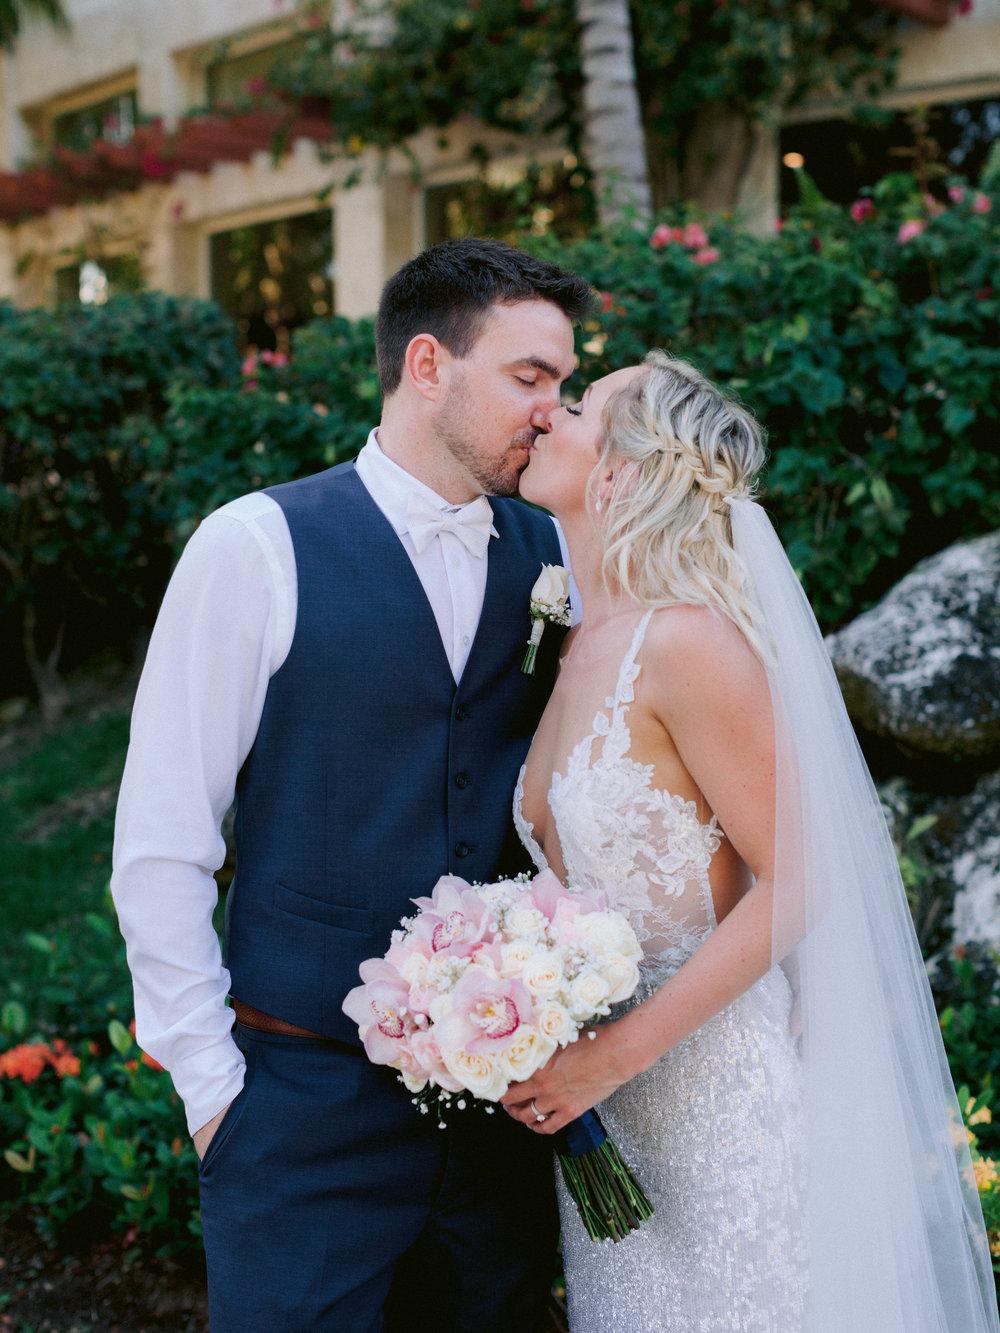 Kim_Jeff_Cancun Wedding_Portraits_Kurtz_Orpia (17 of 178).jpg